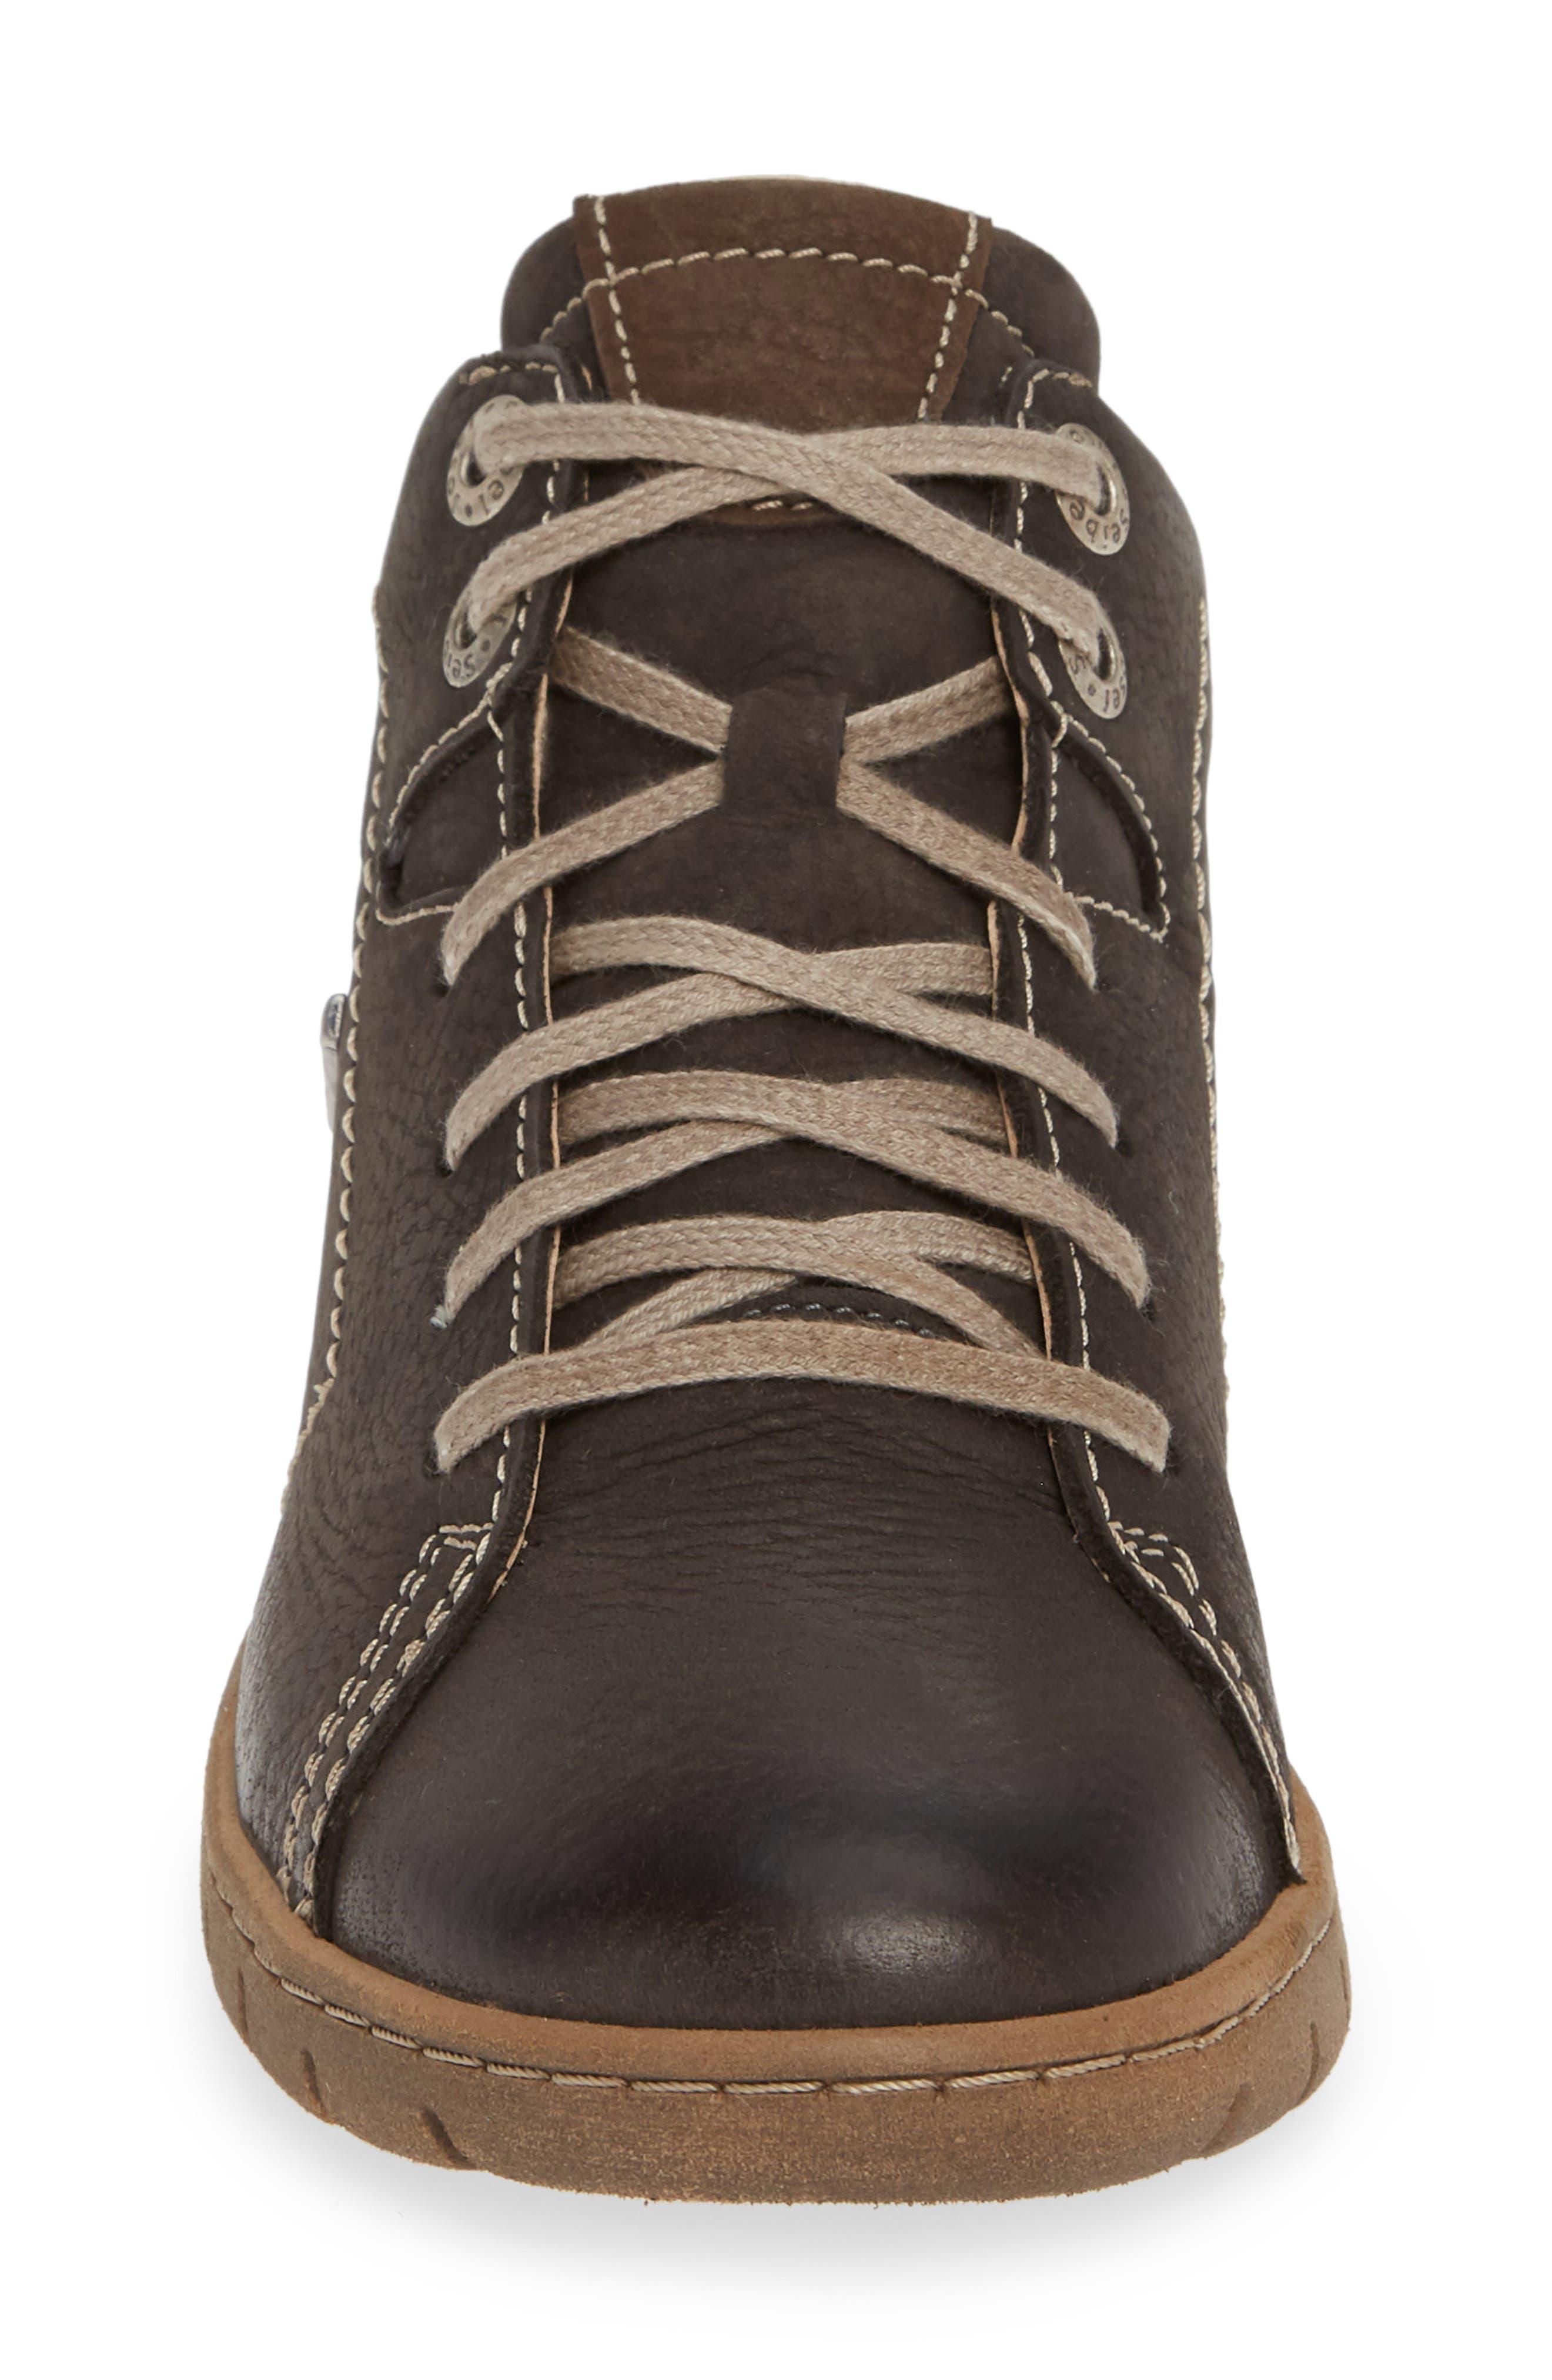 Steffi 58 Sneaker Bootie,                             Alternate thumbnail 4, color,                             TITAN LEATHER